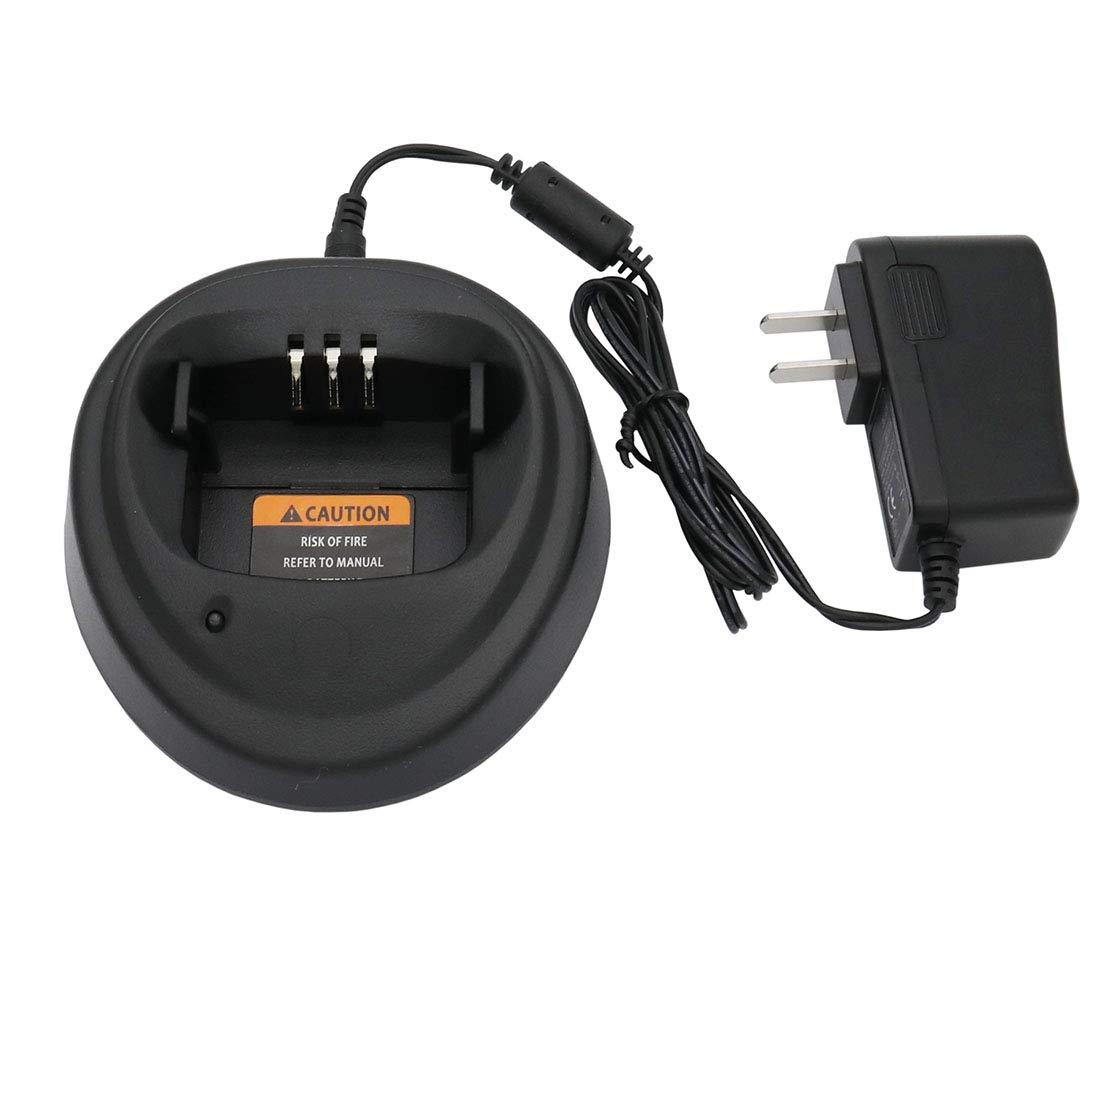 Karier Ni-MH Ni-CD Li-ion Battery Charger for Motorola CP040 CP140 CP150 CP160 CP180 CP340 CP360 CP380 EP450 GP3138 GP3688 PR400 NNTN4496 NNTN4851A